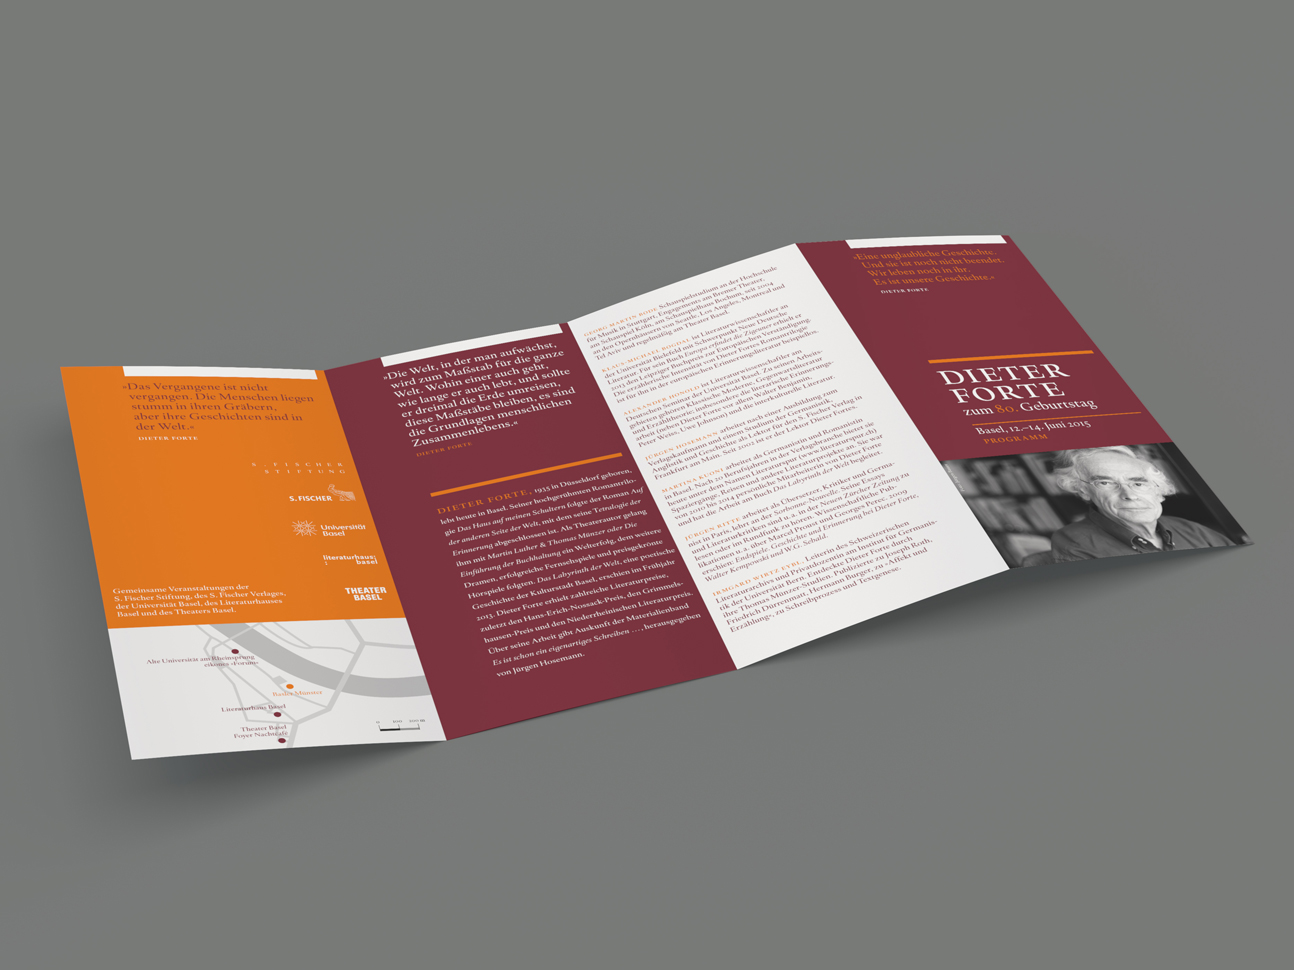 martin_zech_design_projekt_design_dieter_forte_programm_2